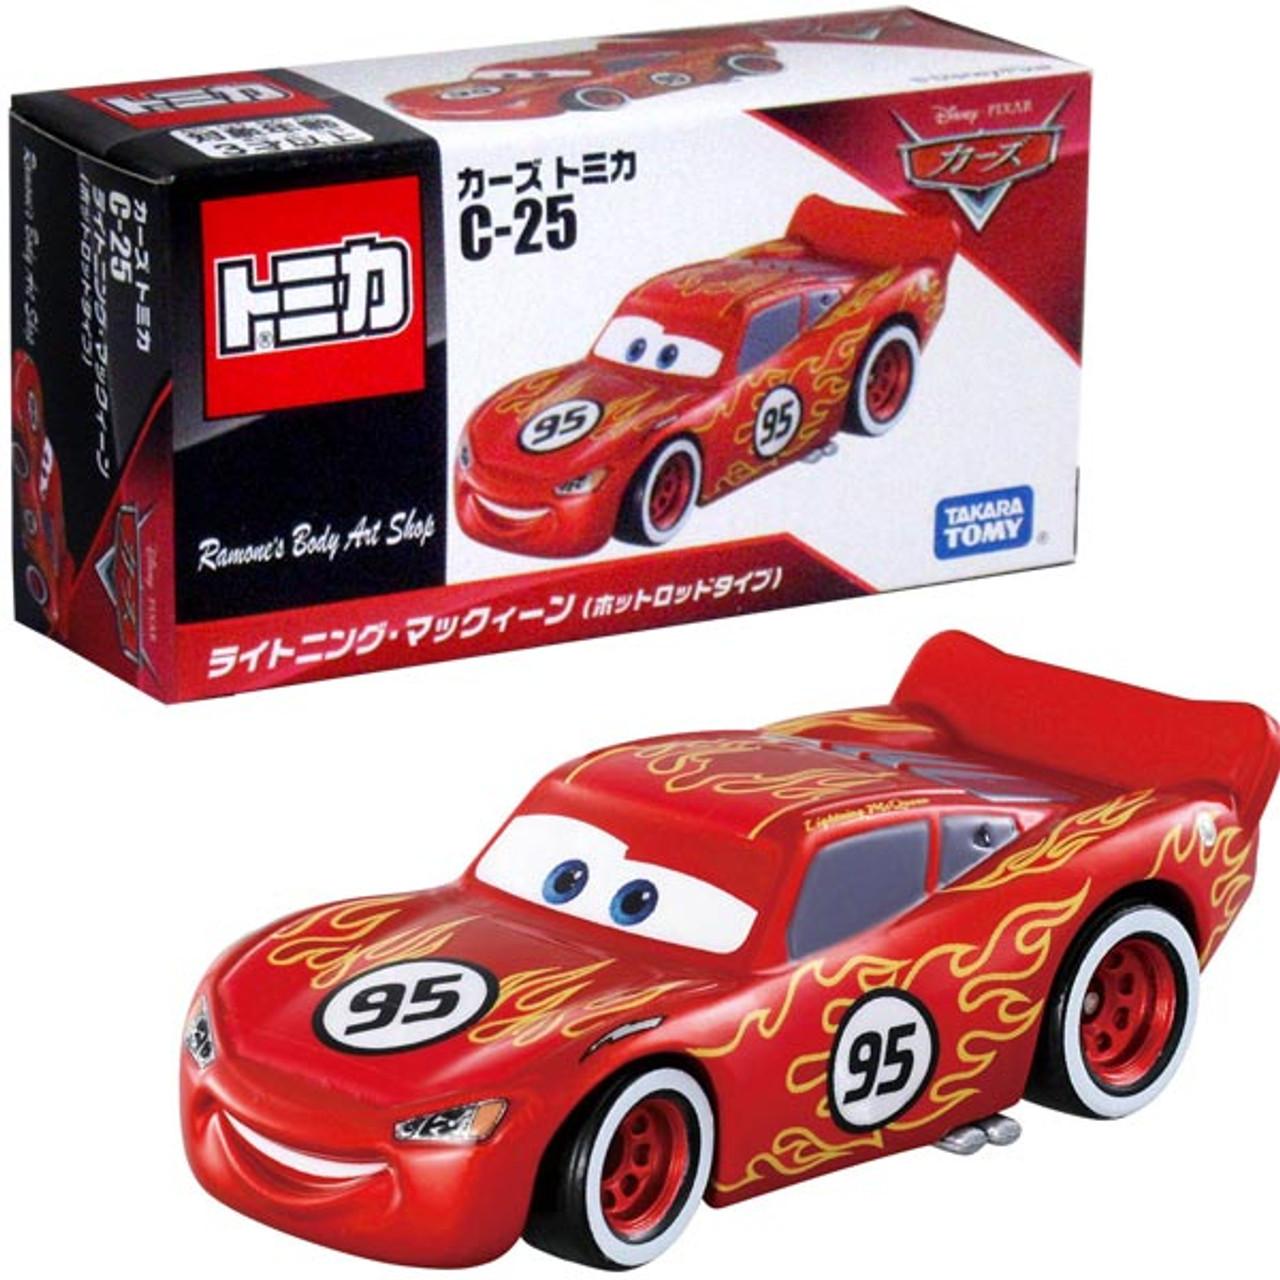 Tomica Takara Tomy Disney Pixar Cars C 25 Lightning Mcqueen Hot Rod Diecast Car Buymarket Store